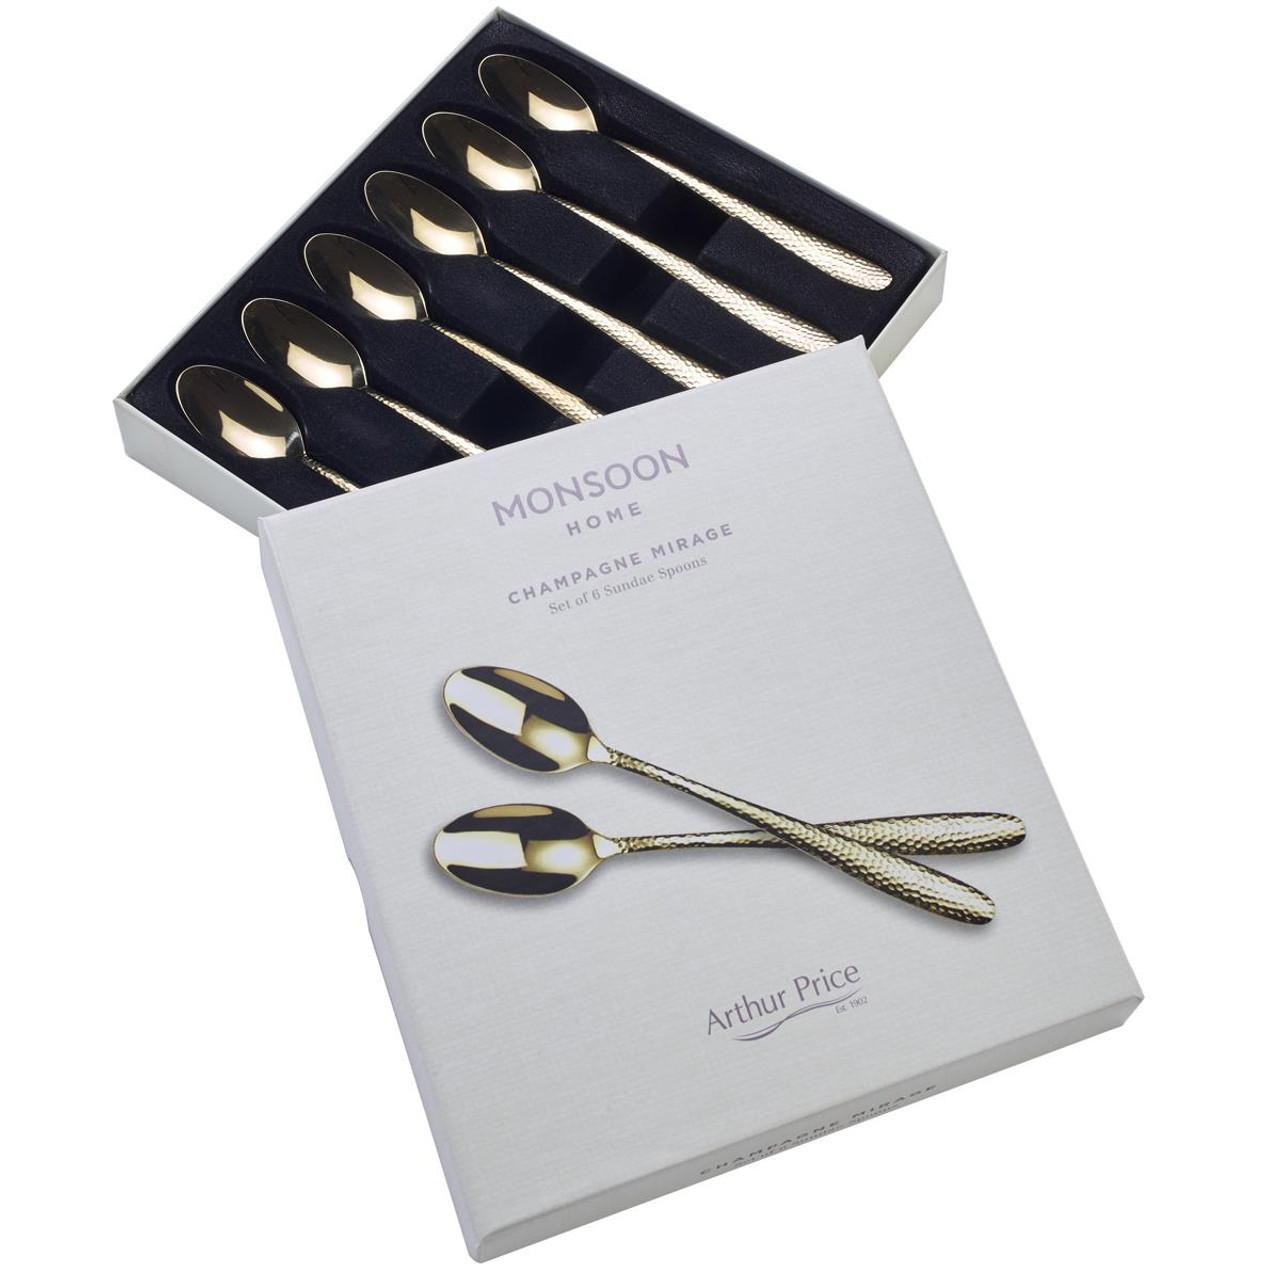 Arthur Price Monsoon Champagne Mirage 6 Sundae Spoons